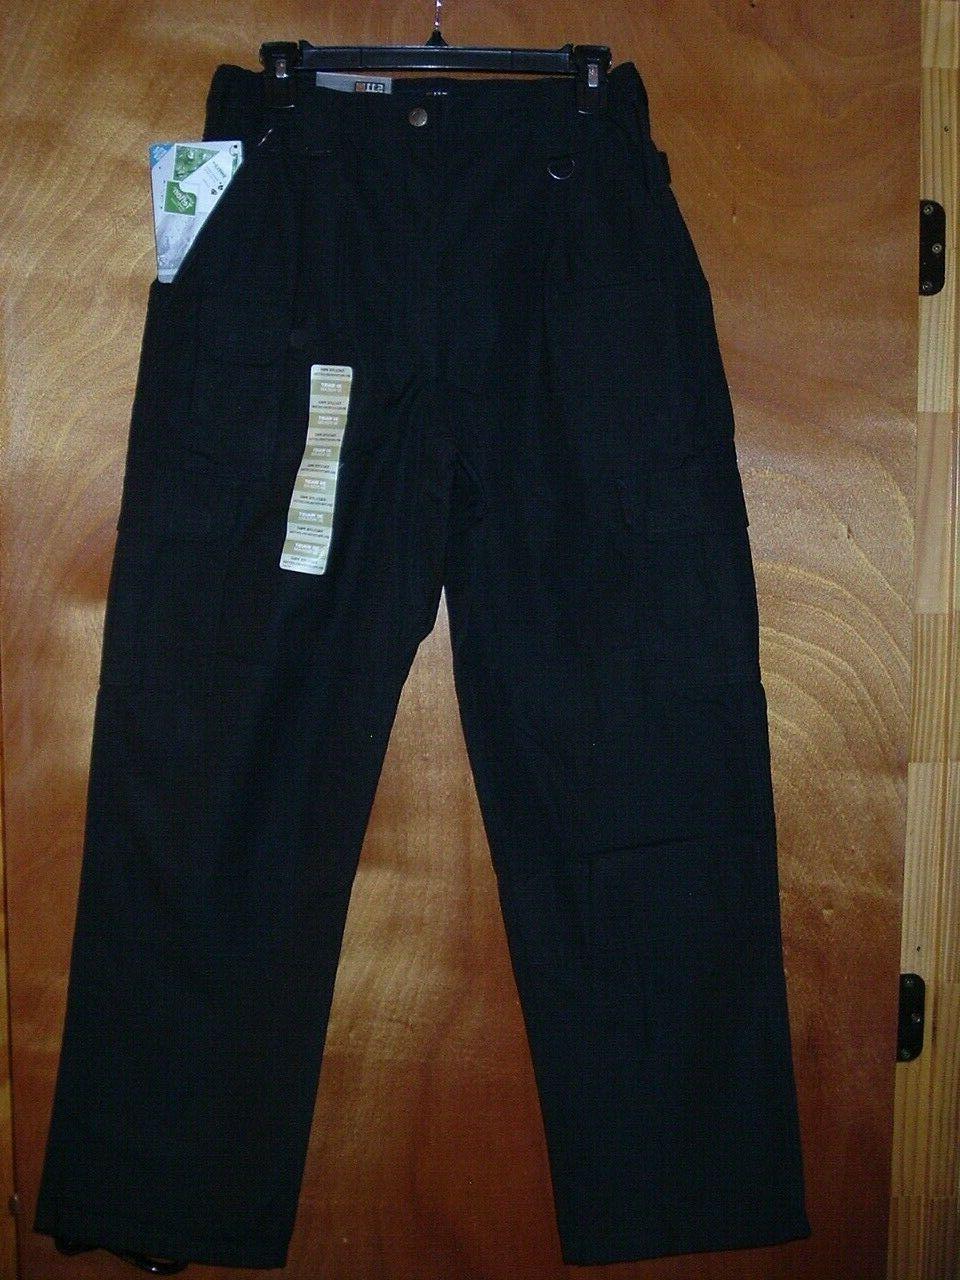 511 Tactical Pro BLACK Pocket 30